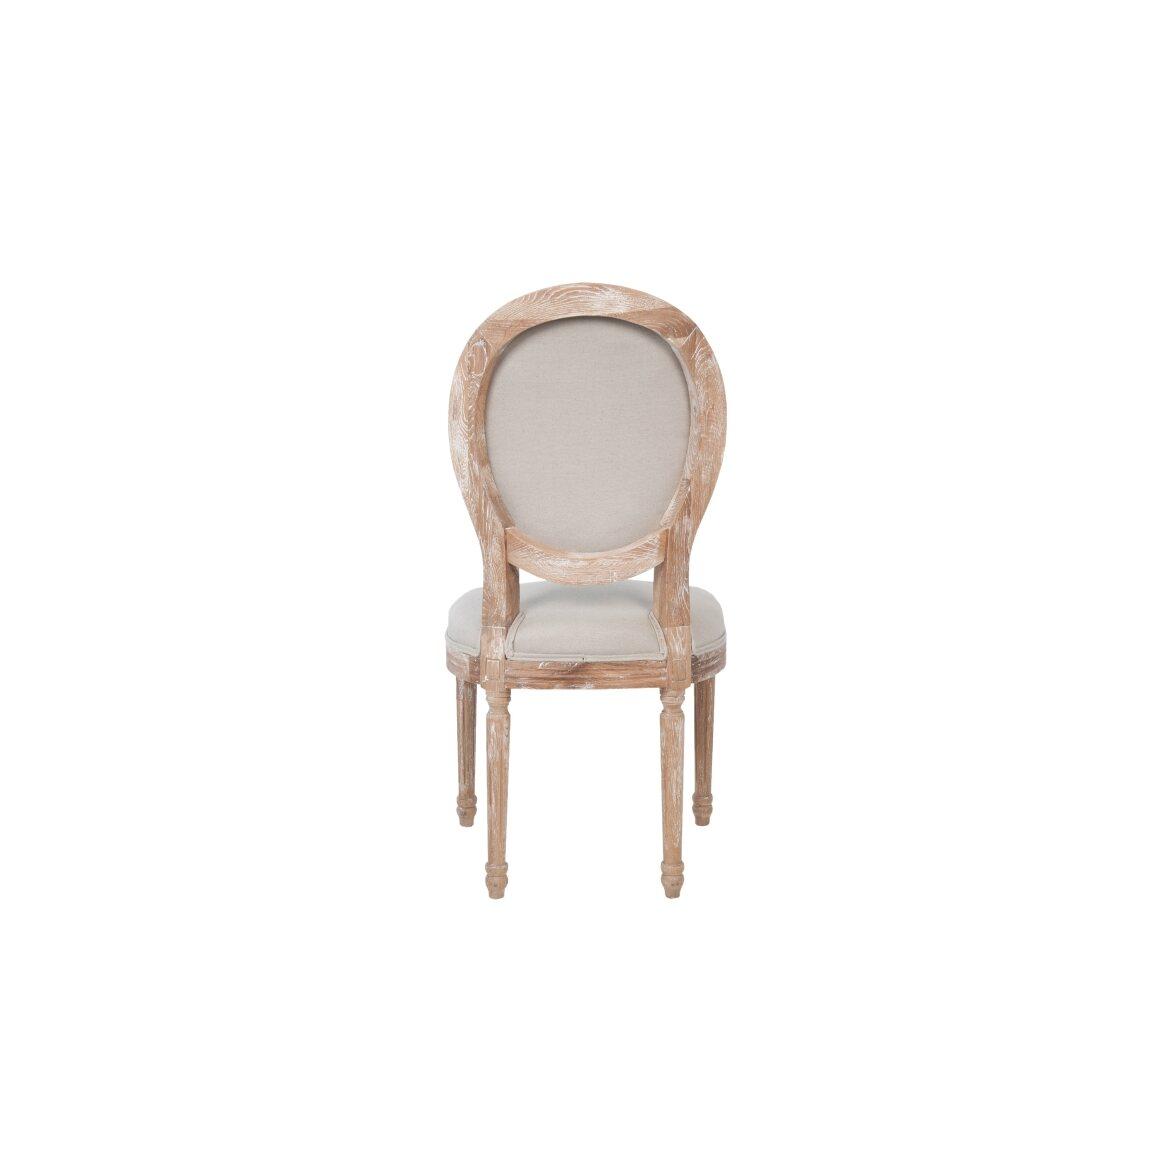 Стул Miro beige 3 | Обеденные стулья Kingsby